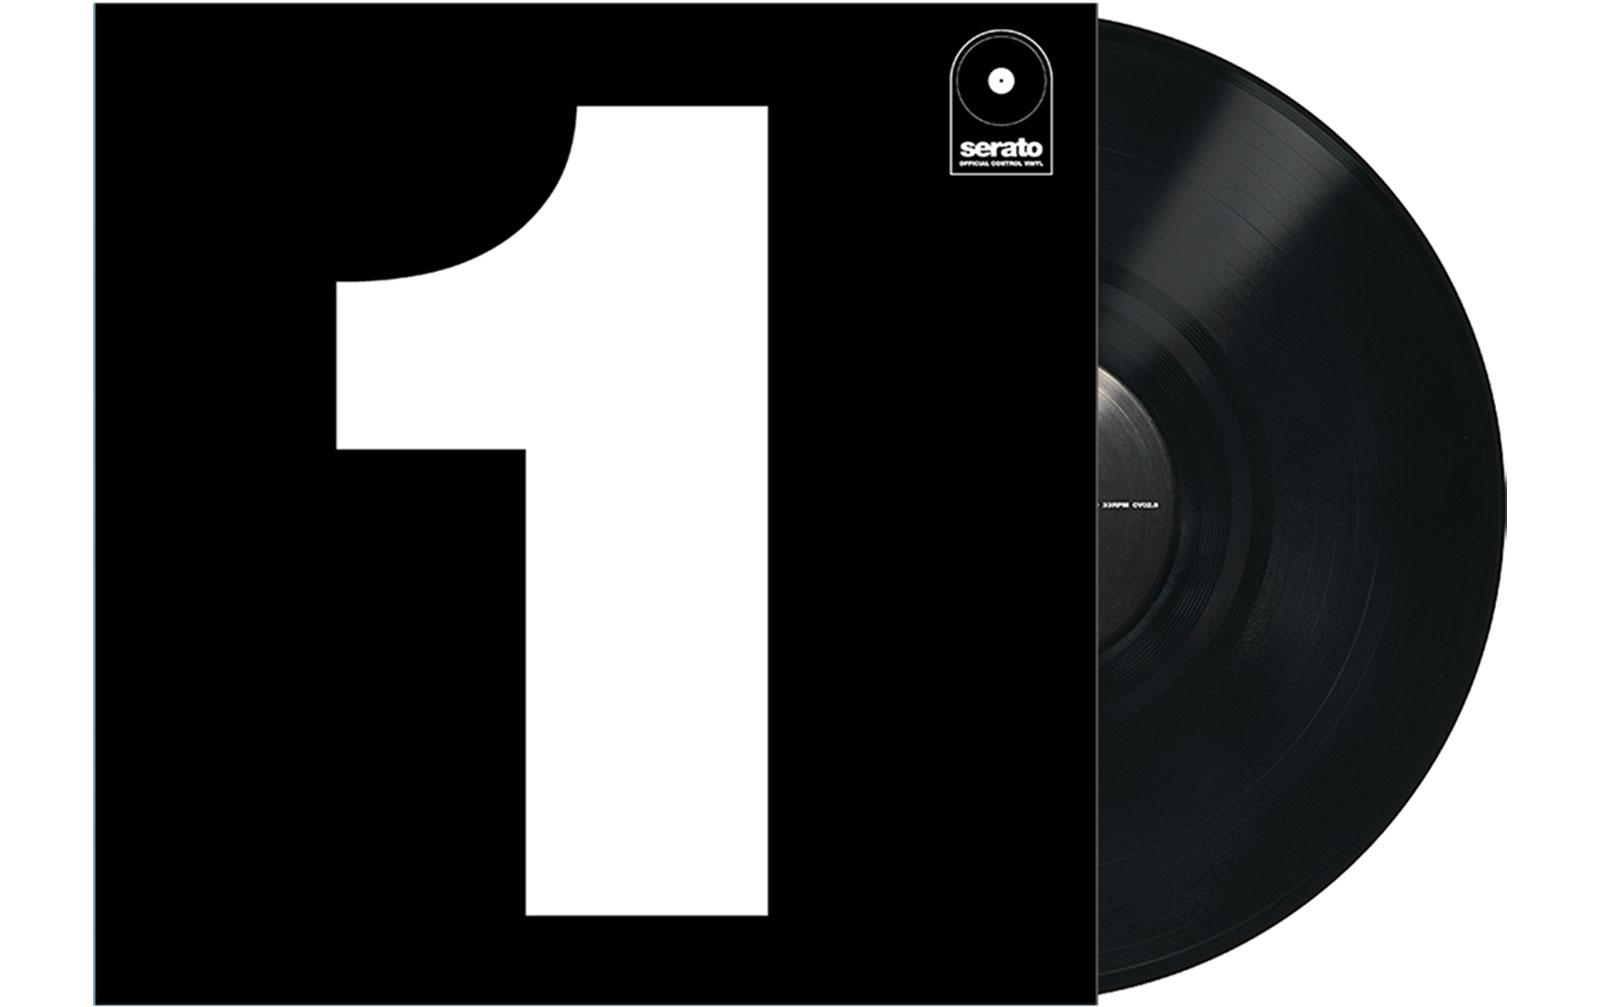 serato-12-single-control-vinyl-schwarz-performance-serie-cv2-5